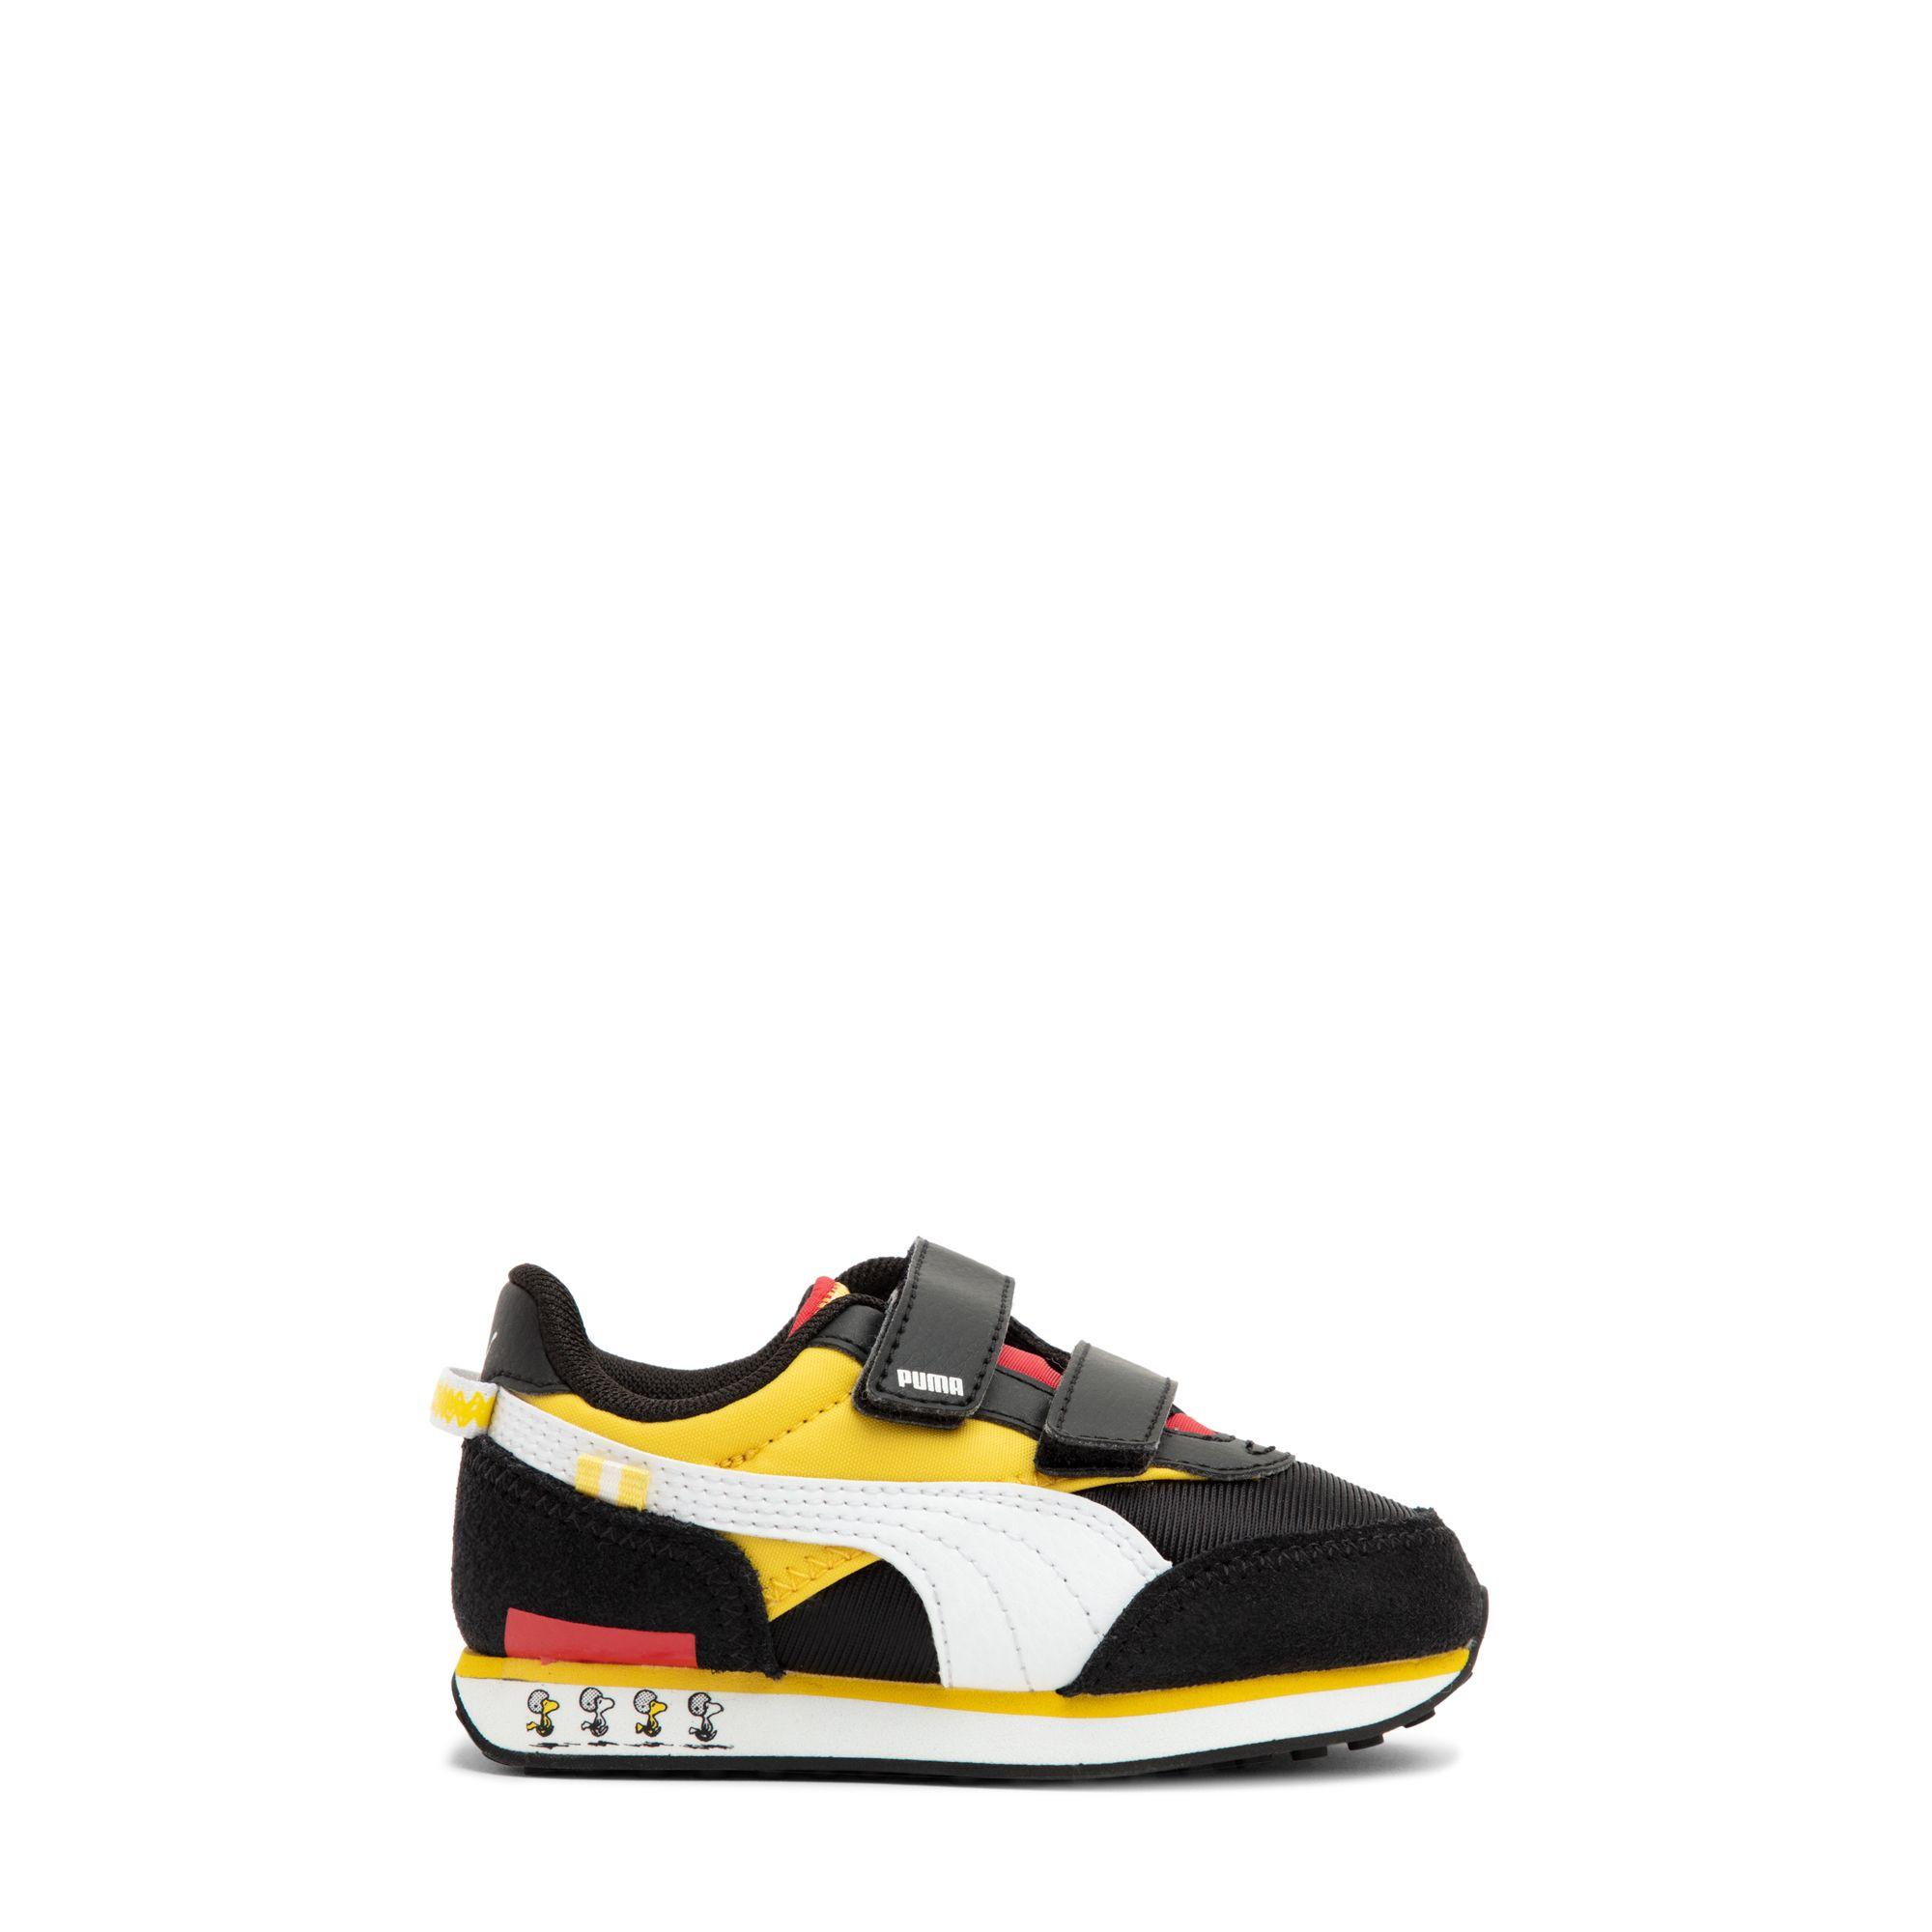 x Peanuts Future Rider sneakers